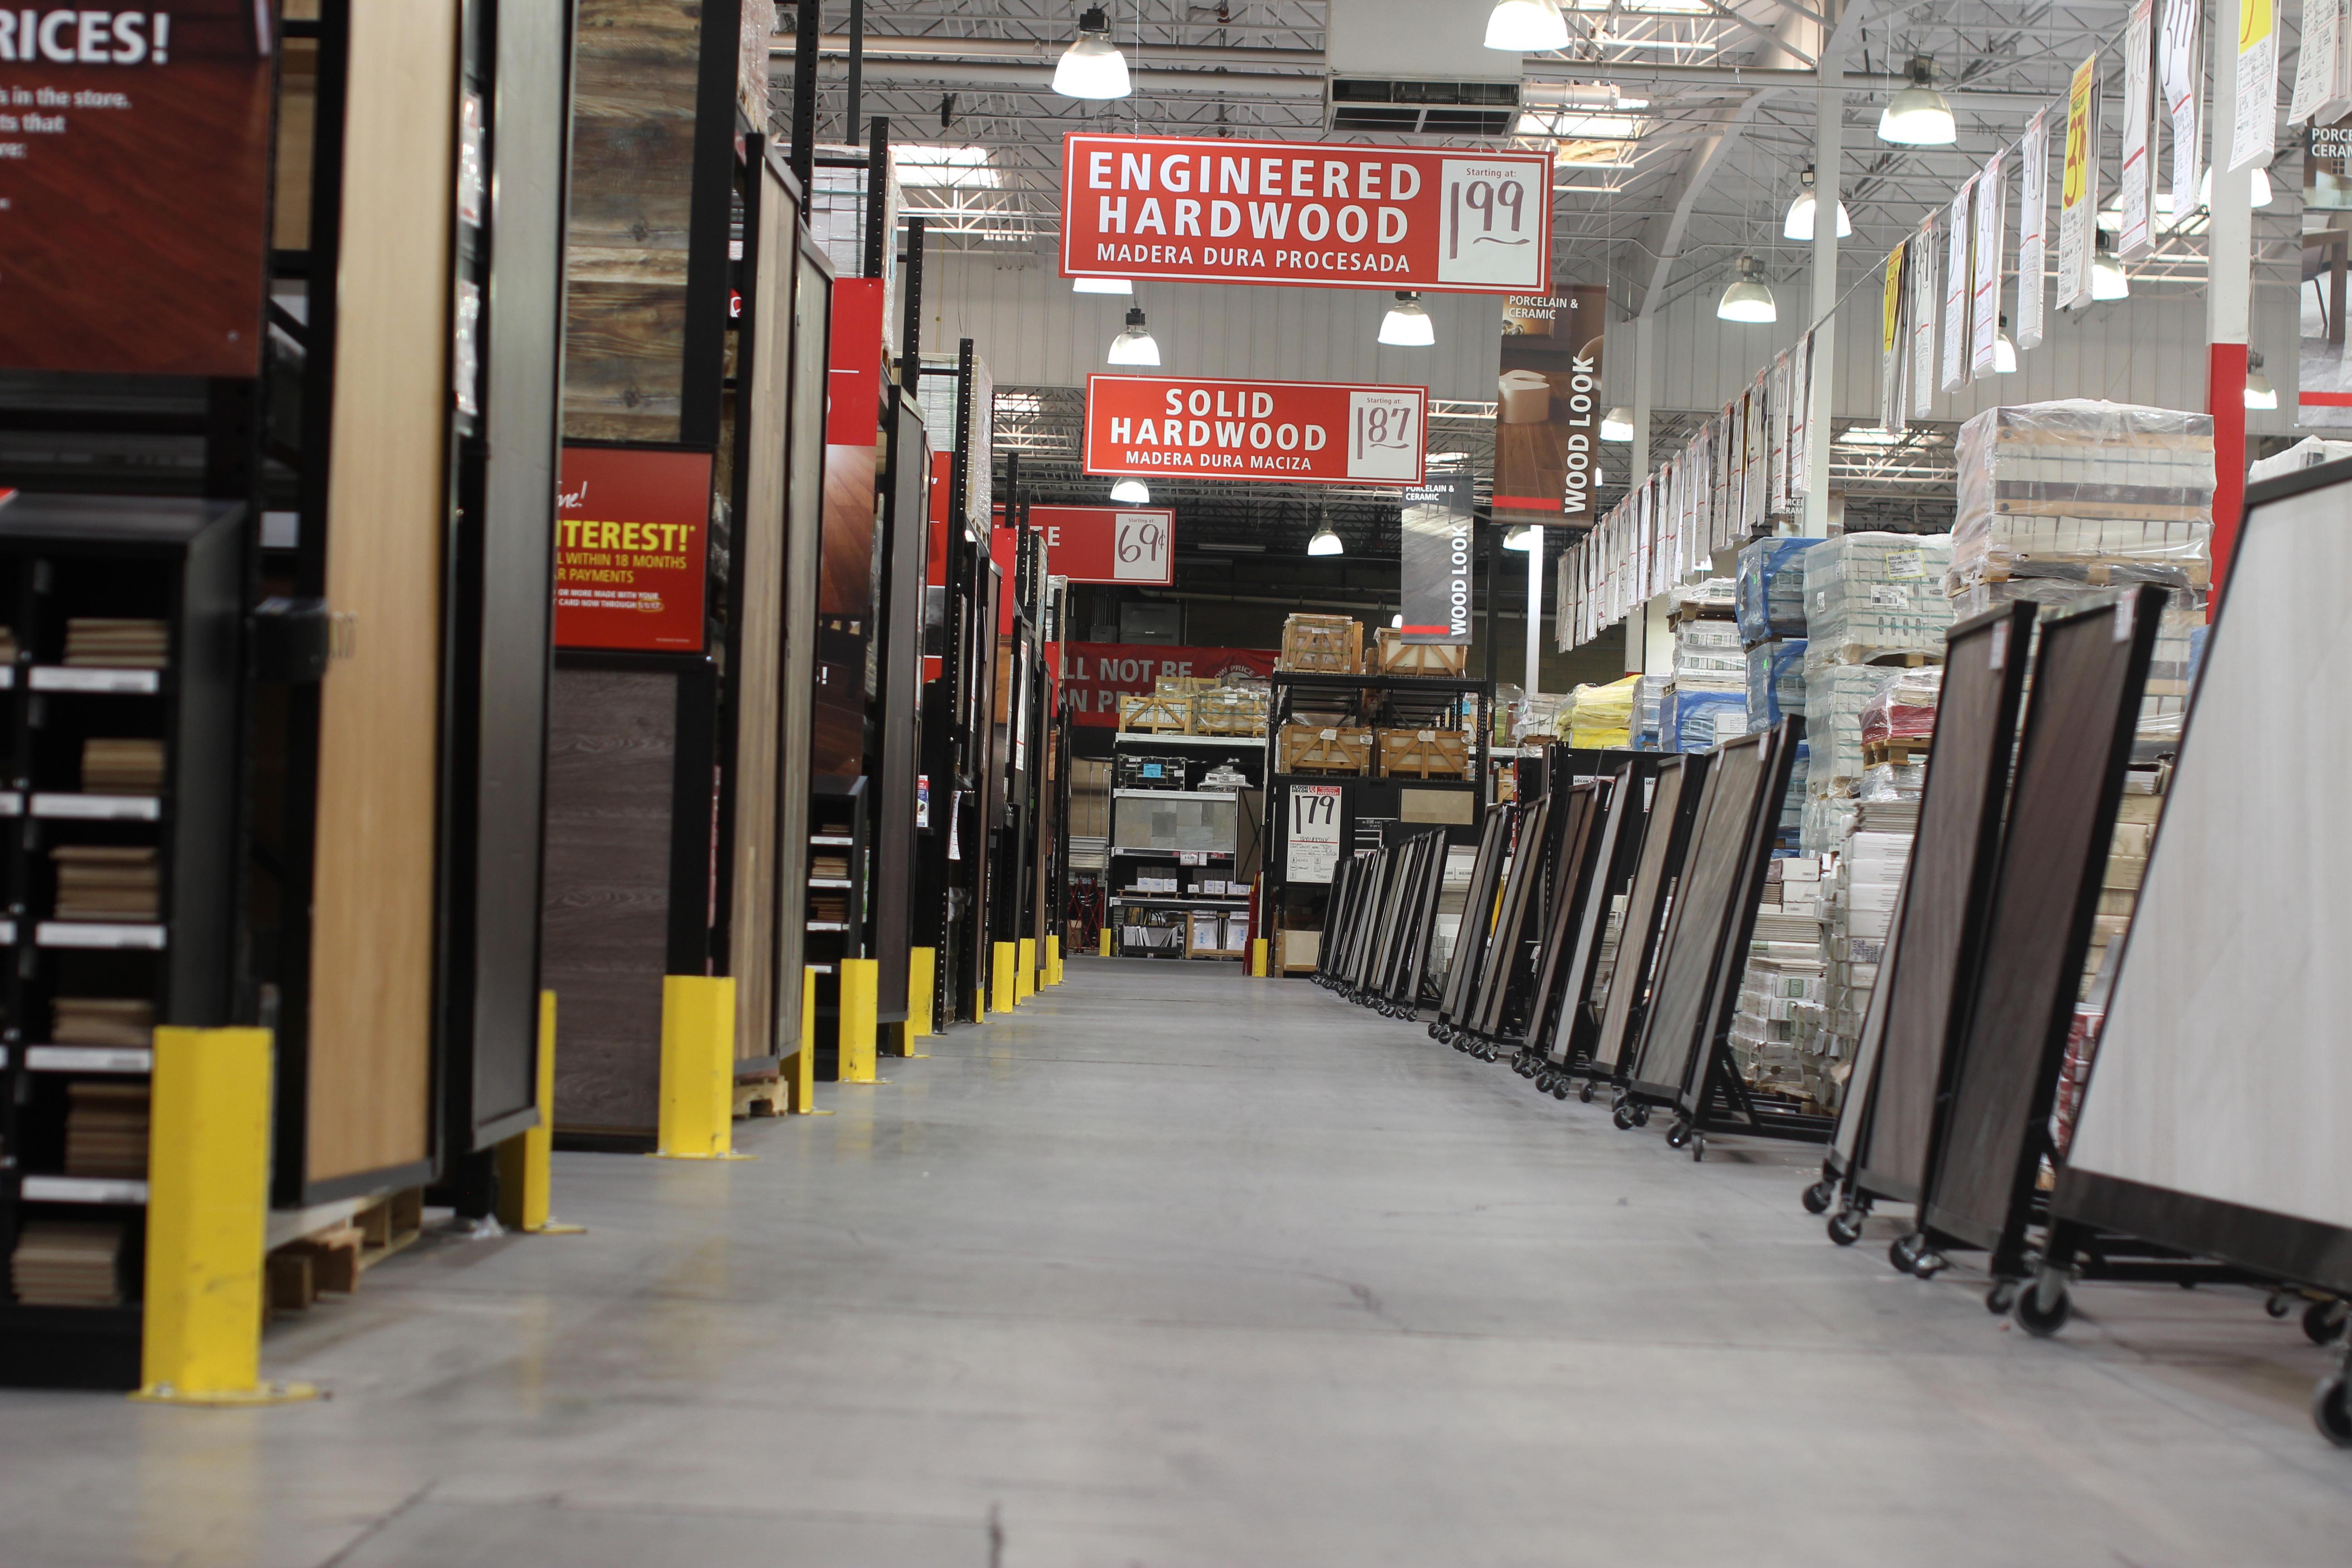 Floor U0026 Decor 1080 W Sunset Rd Henderson, NV Hardwood Flooring   MapQuest